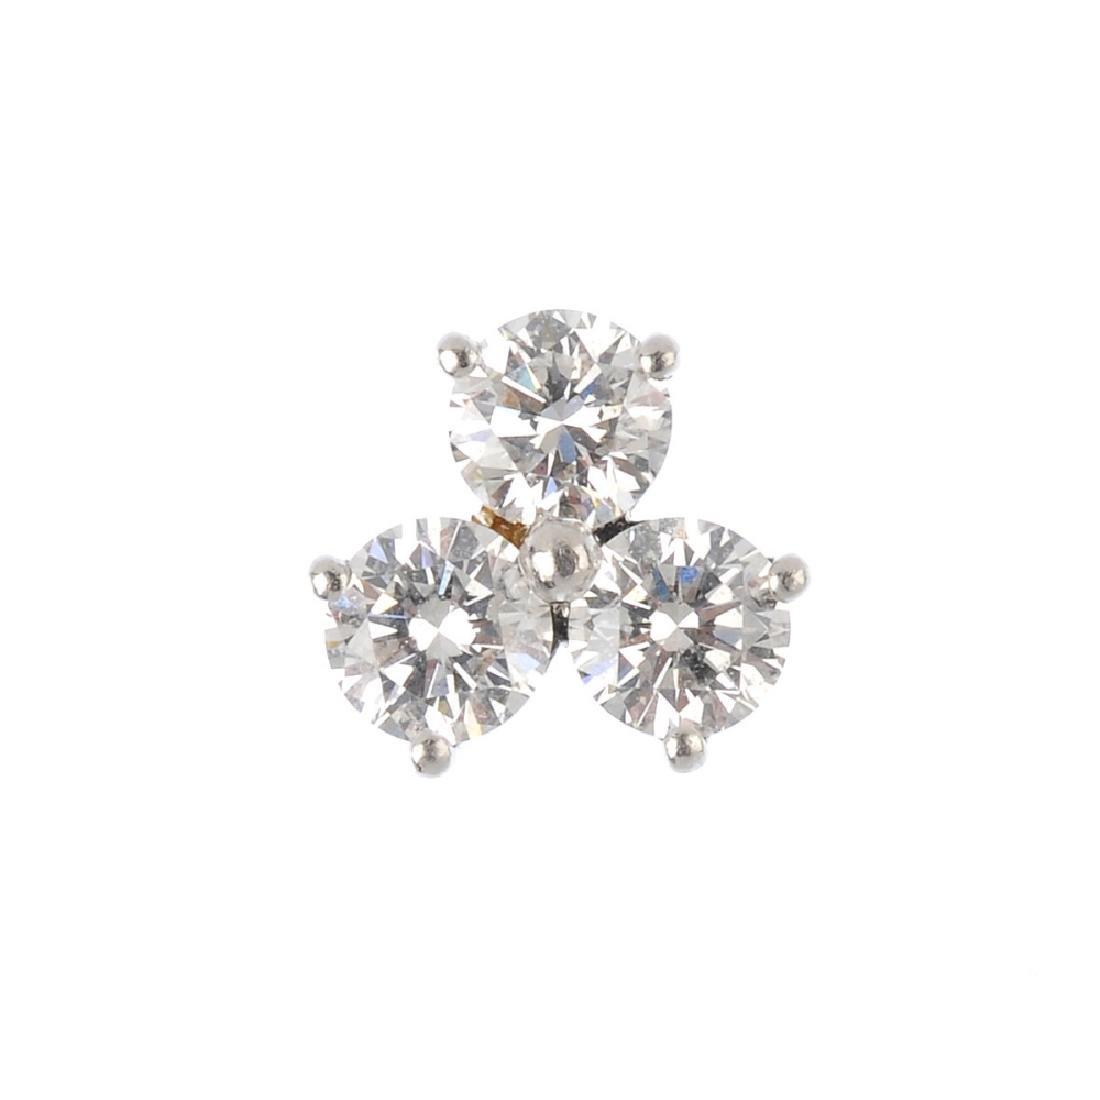 TIFFANY & CO. - a single platinum diamond stud earring.